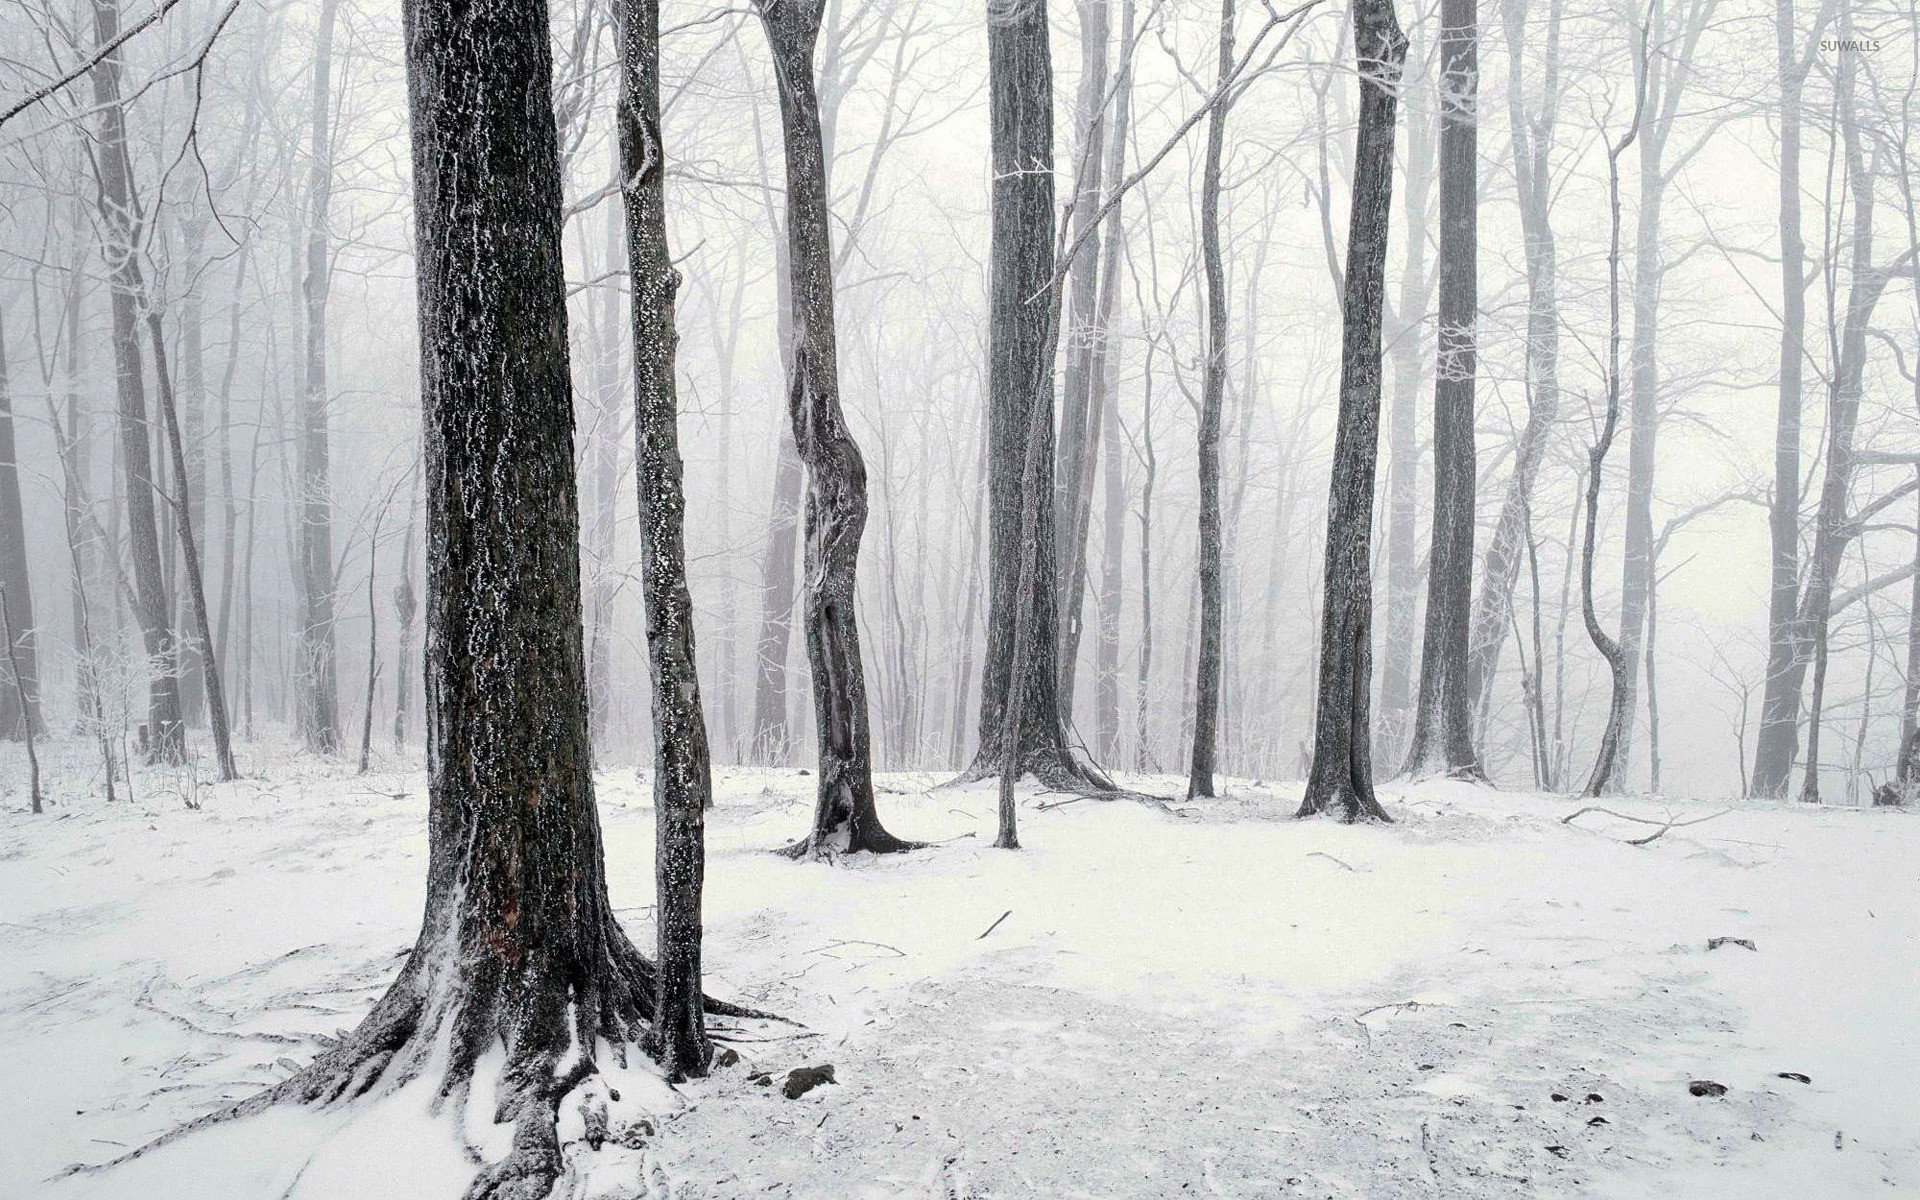 Winter in the forest wallpaper jpg